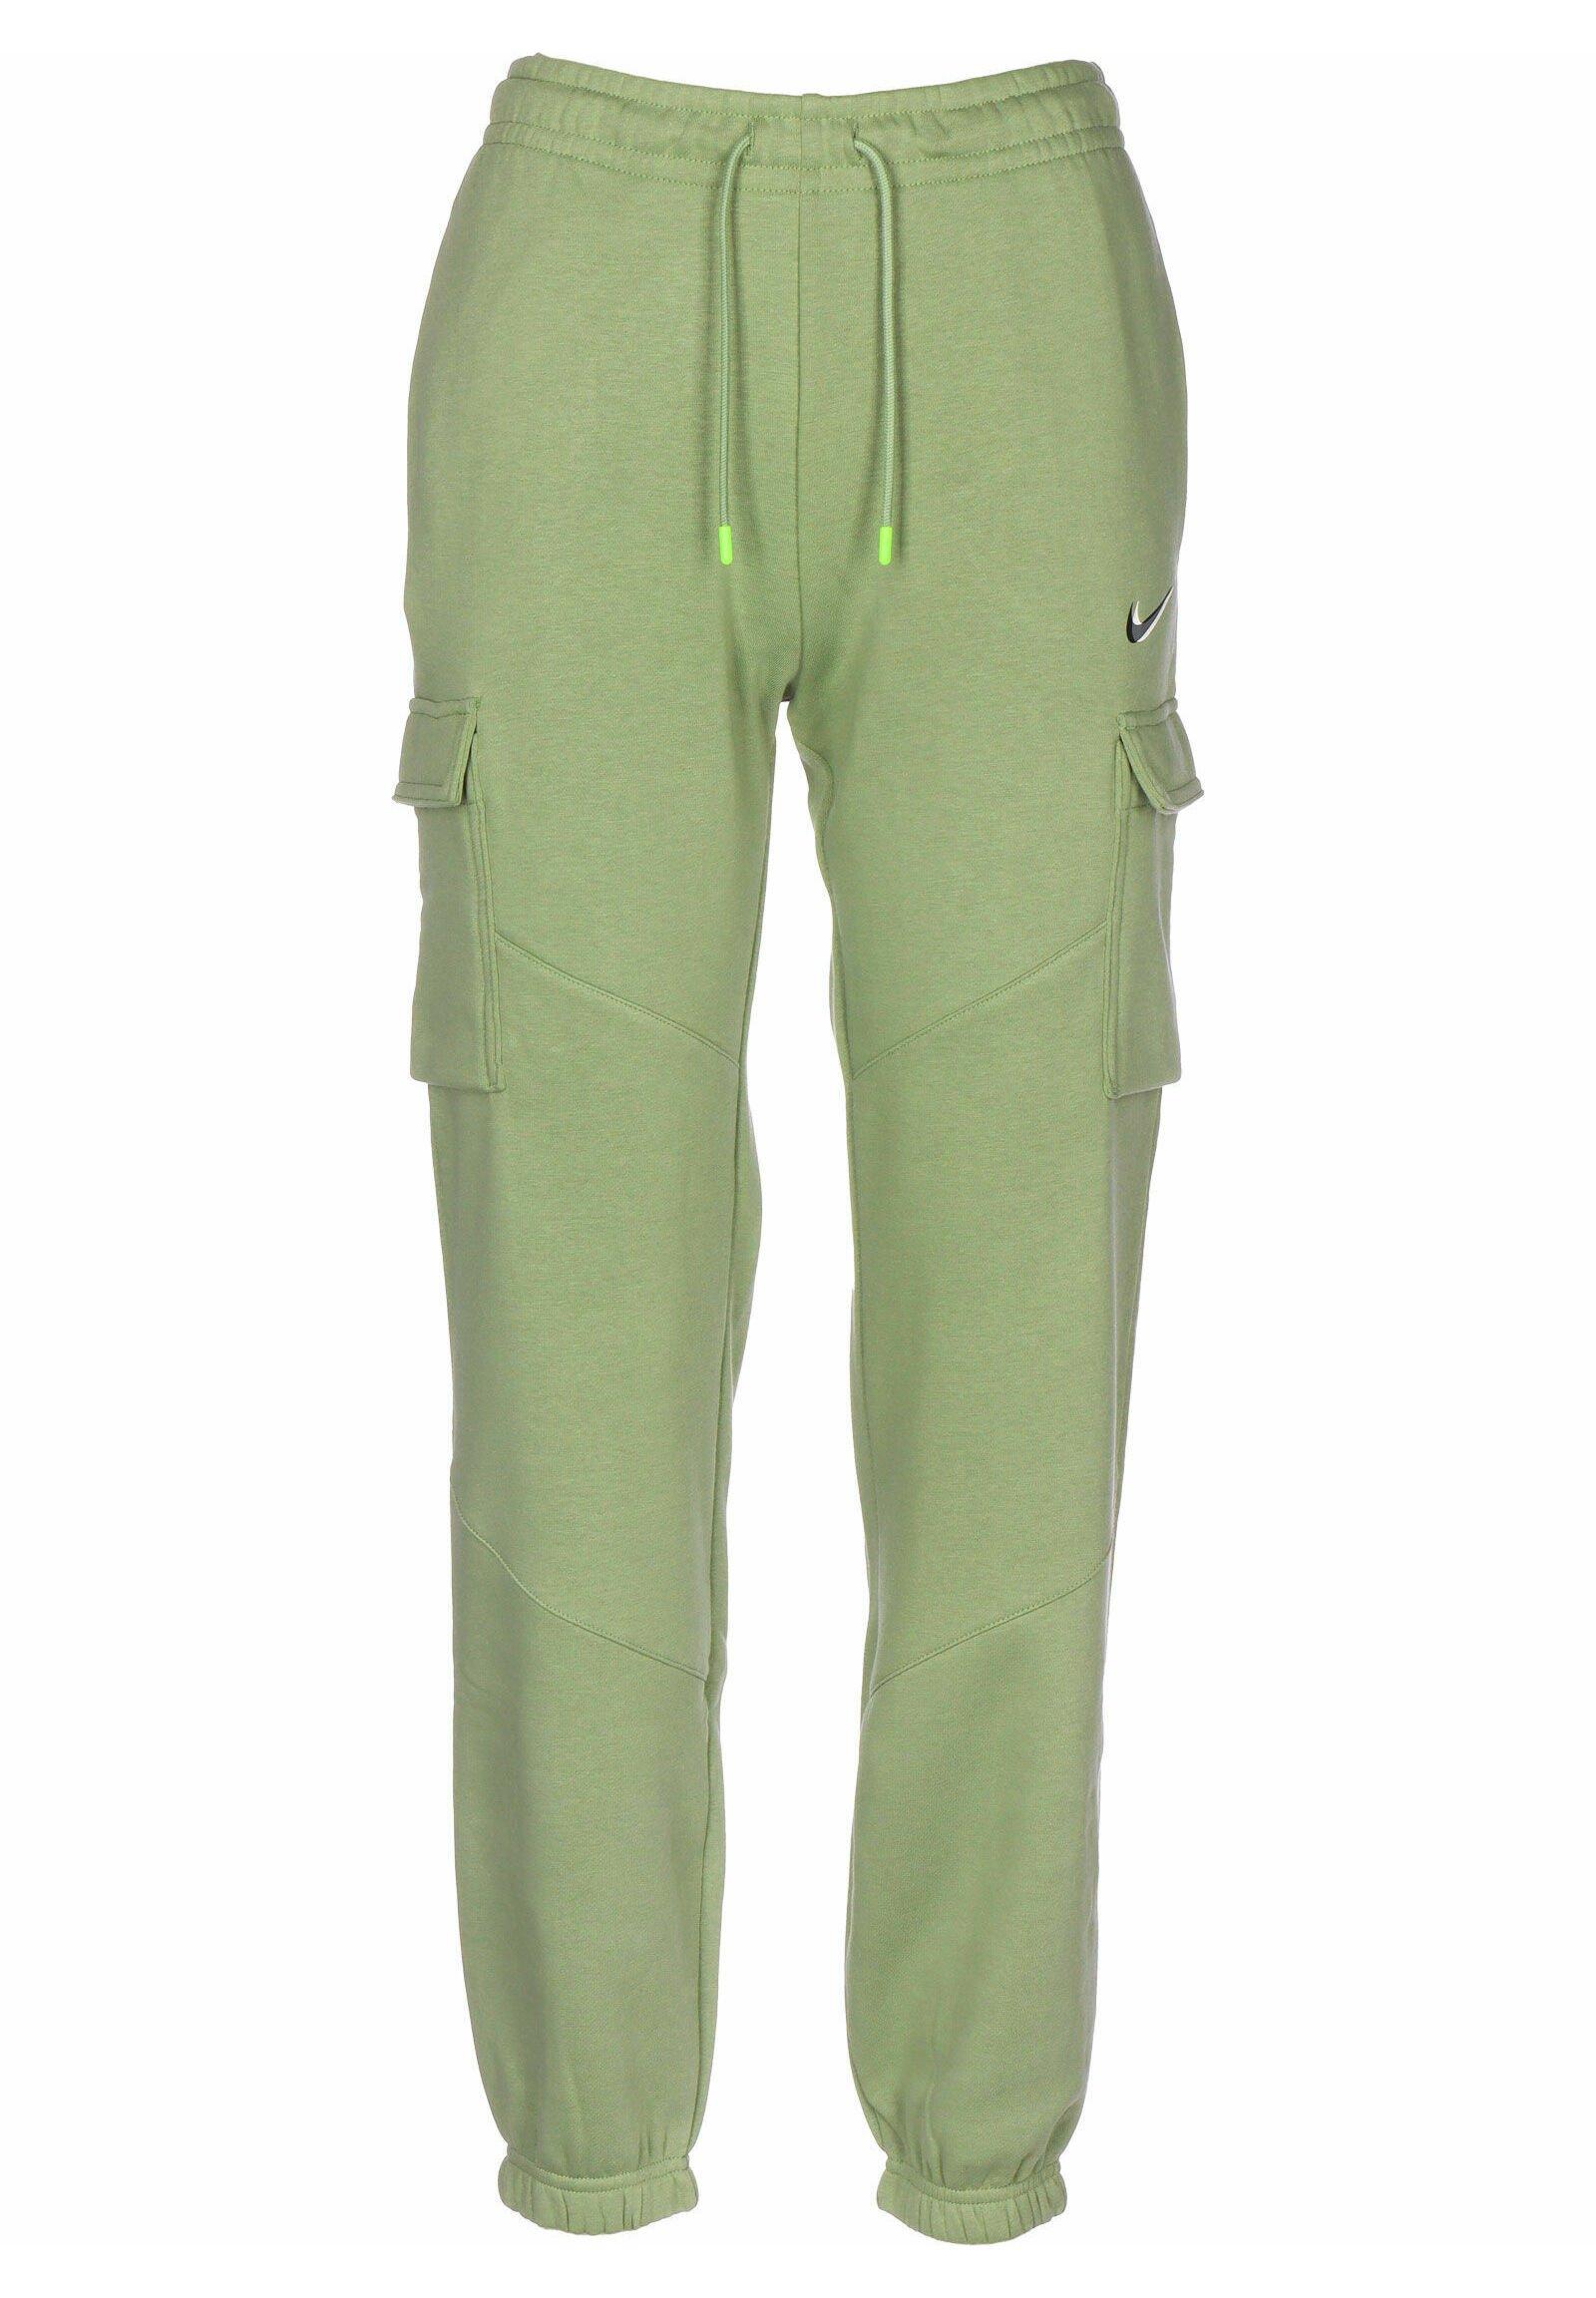 Femme NSW PRINT - Pantalon cargo